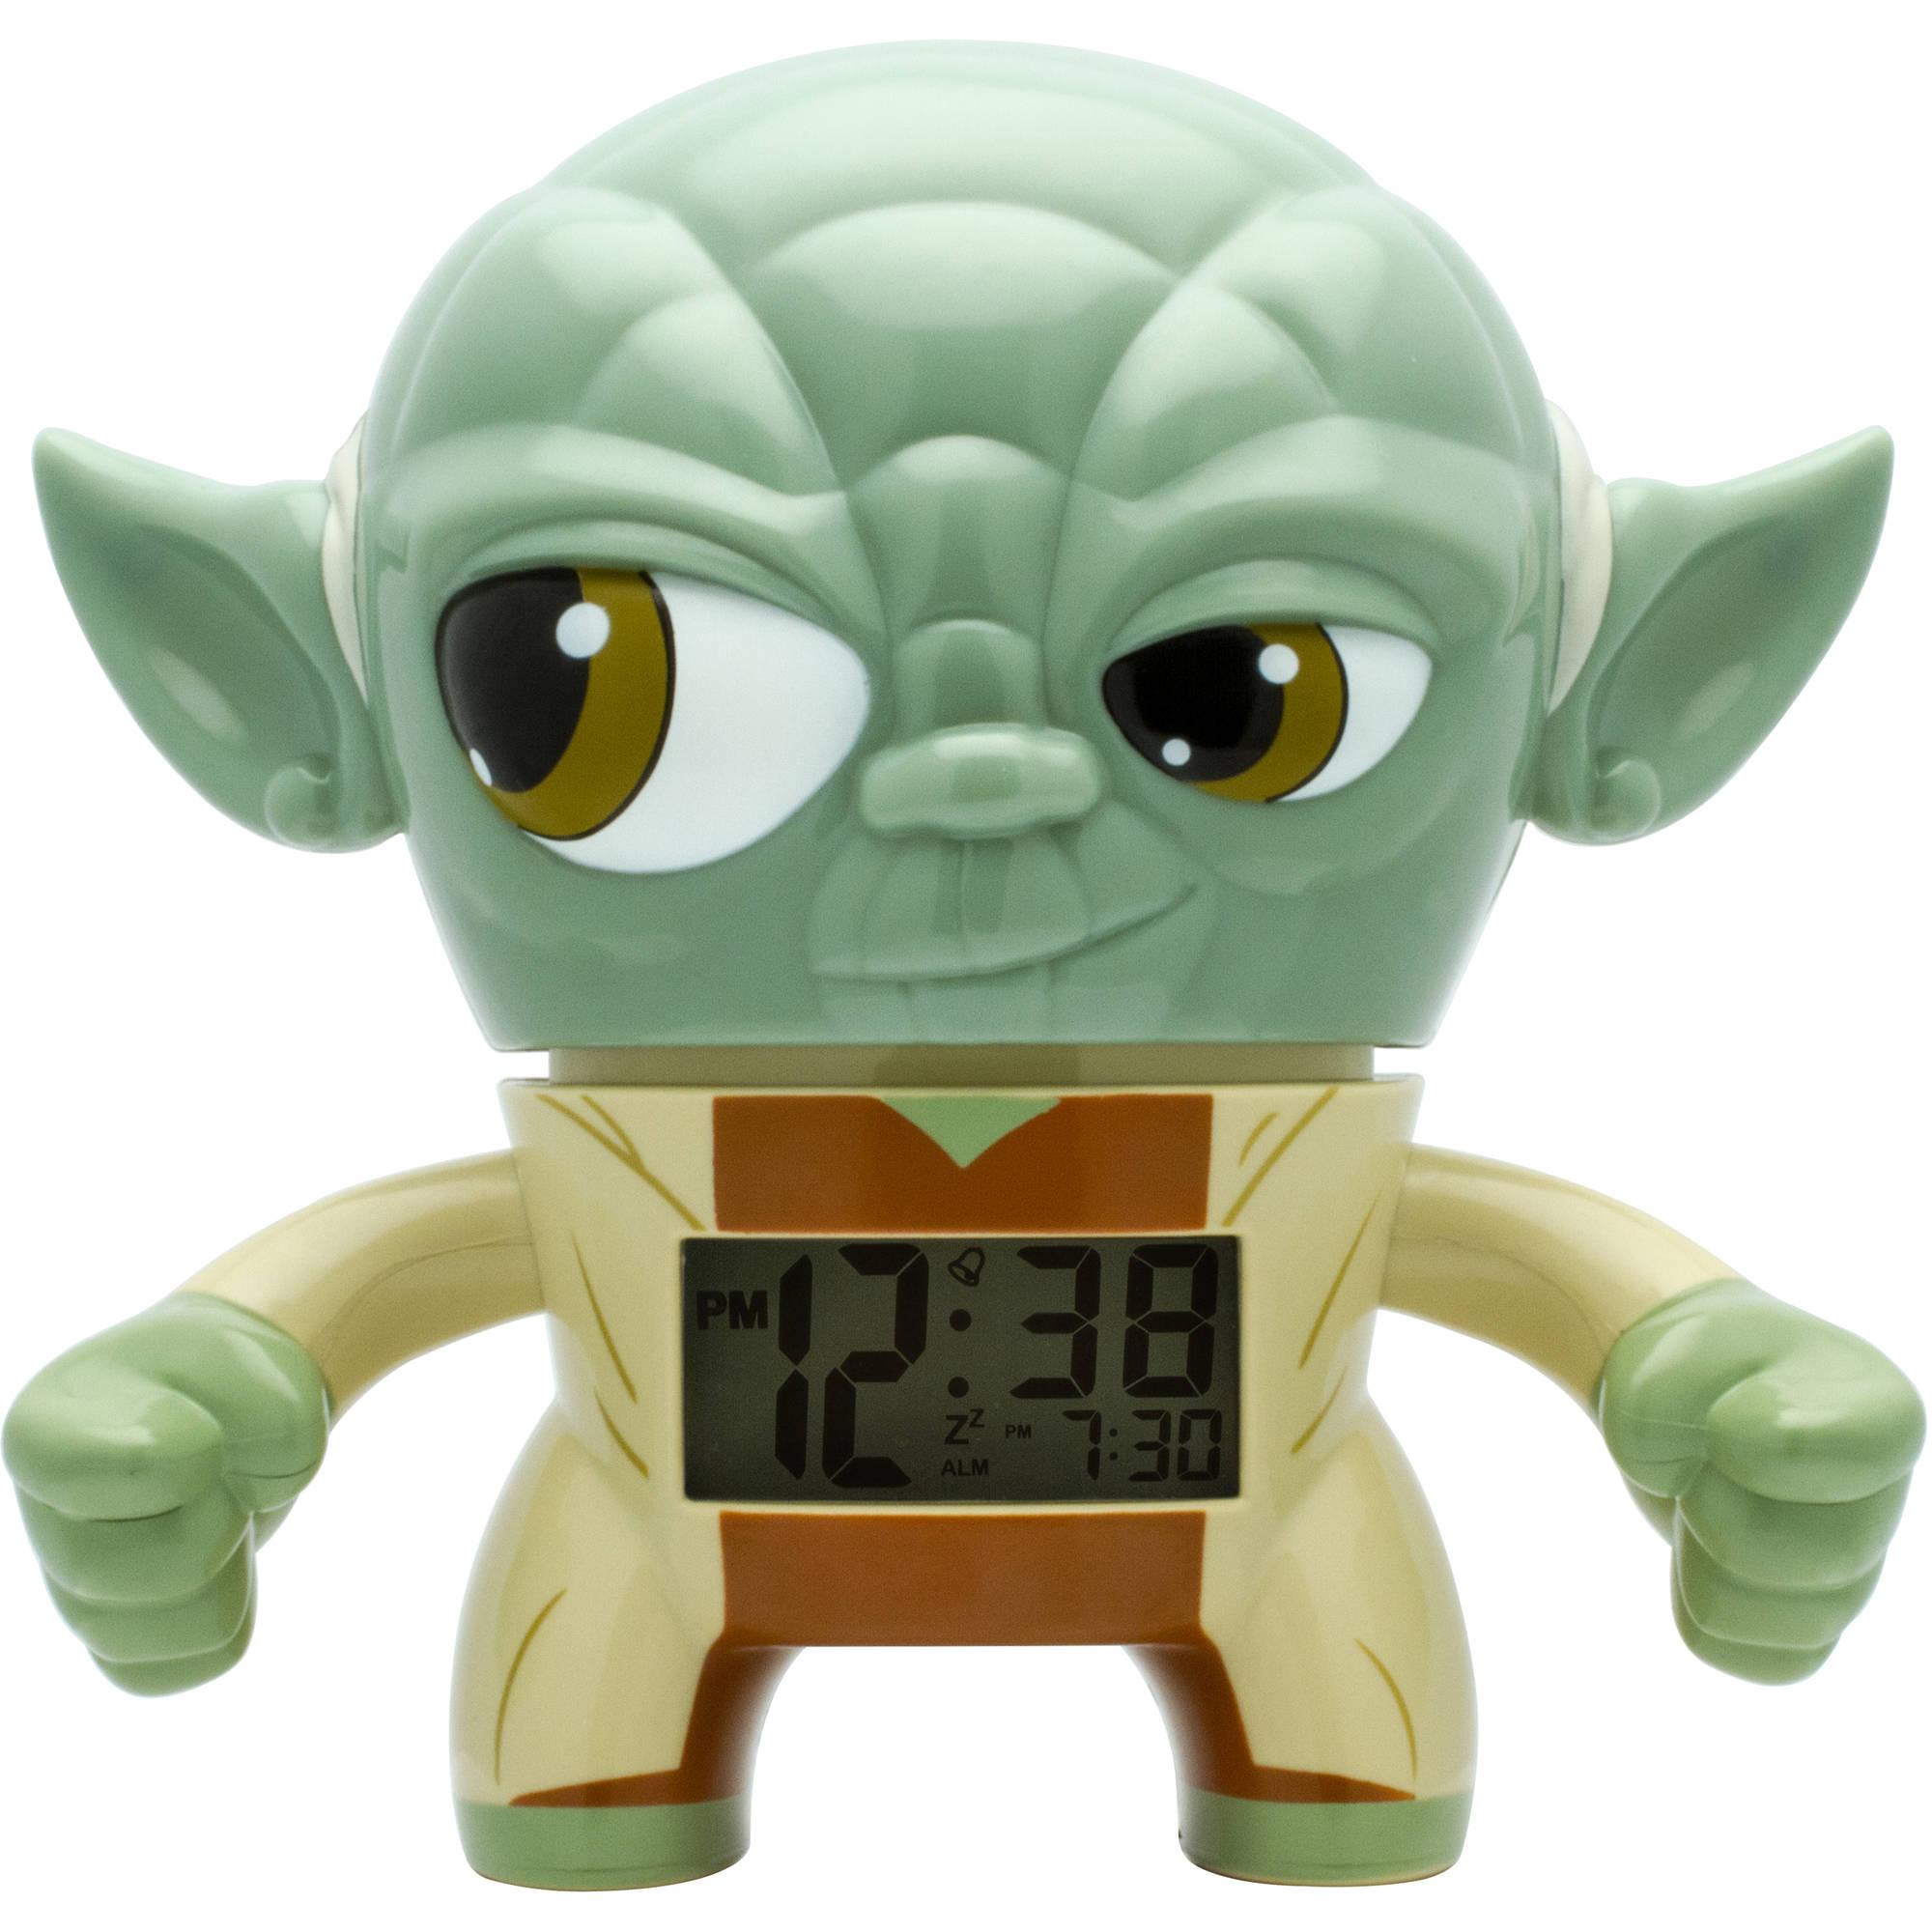 BulbBotz™ Star Wars™ Yoda™ Light-Up Alarm Clock (7.5 inch)